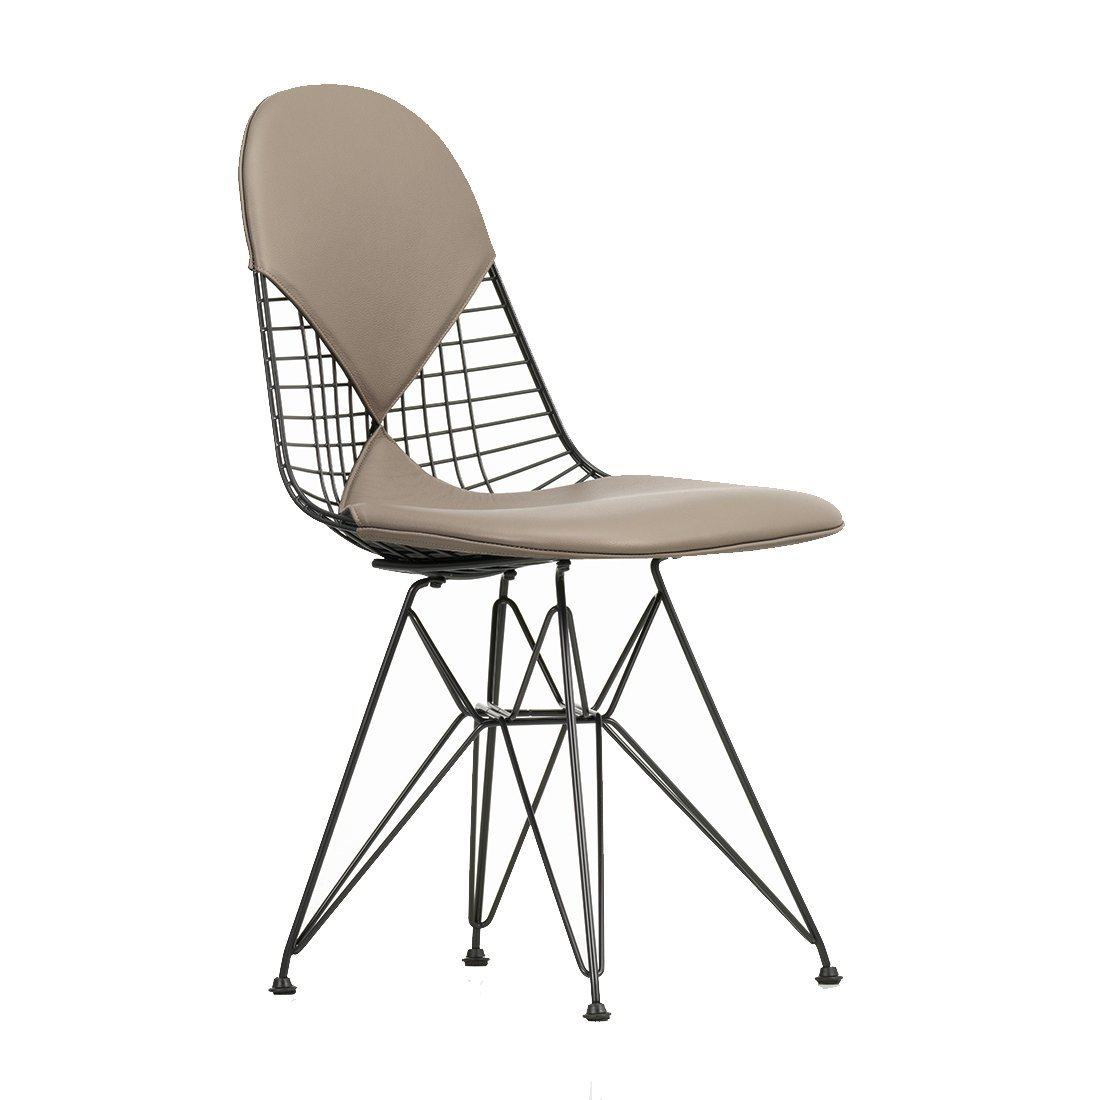 Vitra Wire Chair DKR-2 - Leder Zand/Plano Coffee